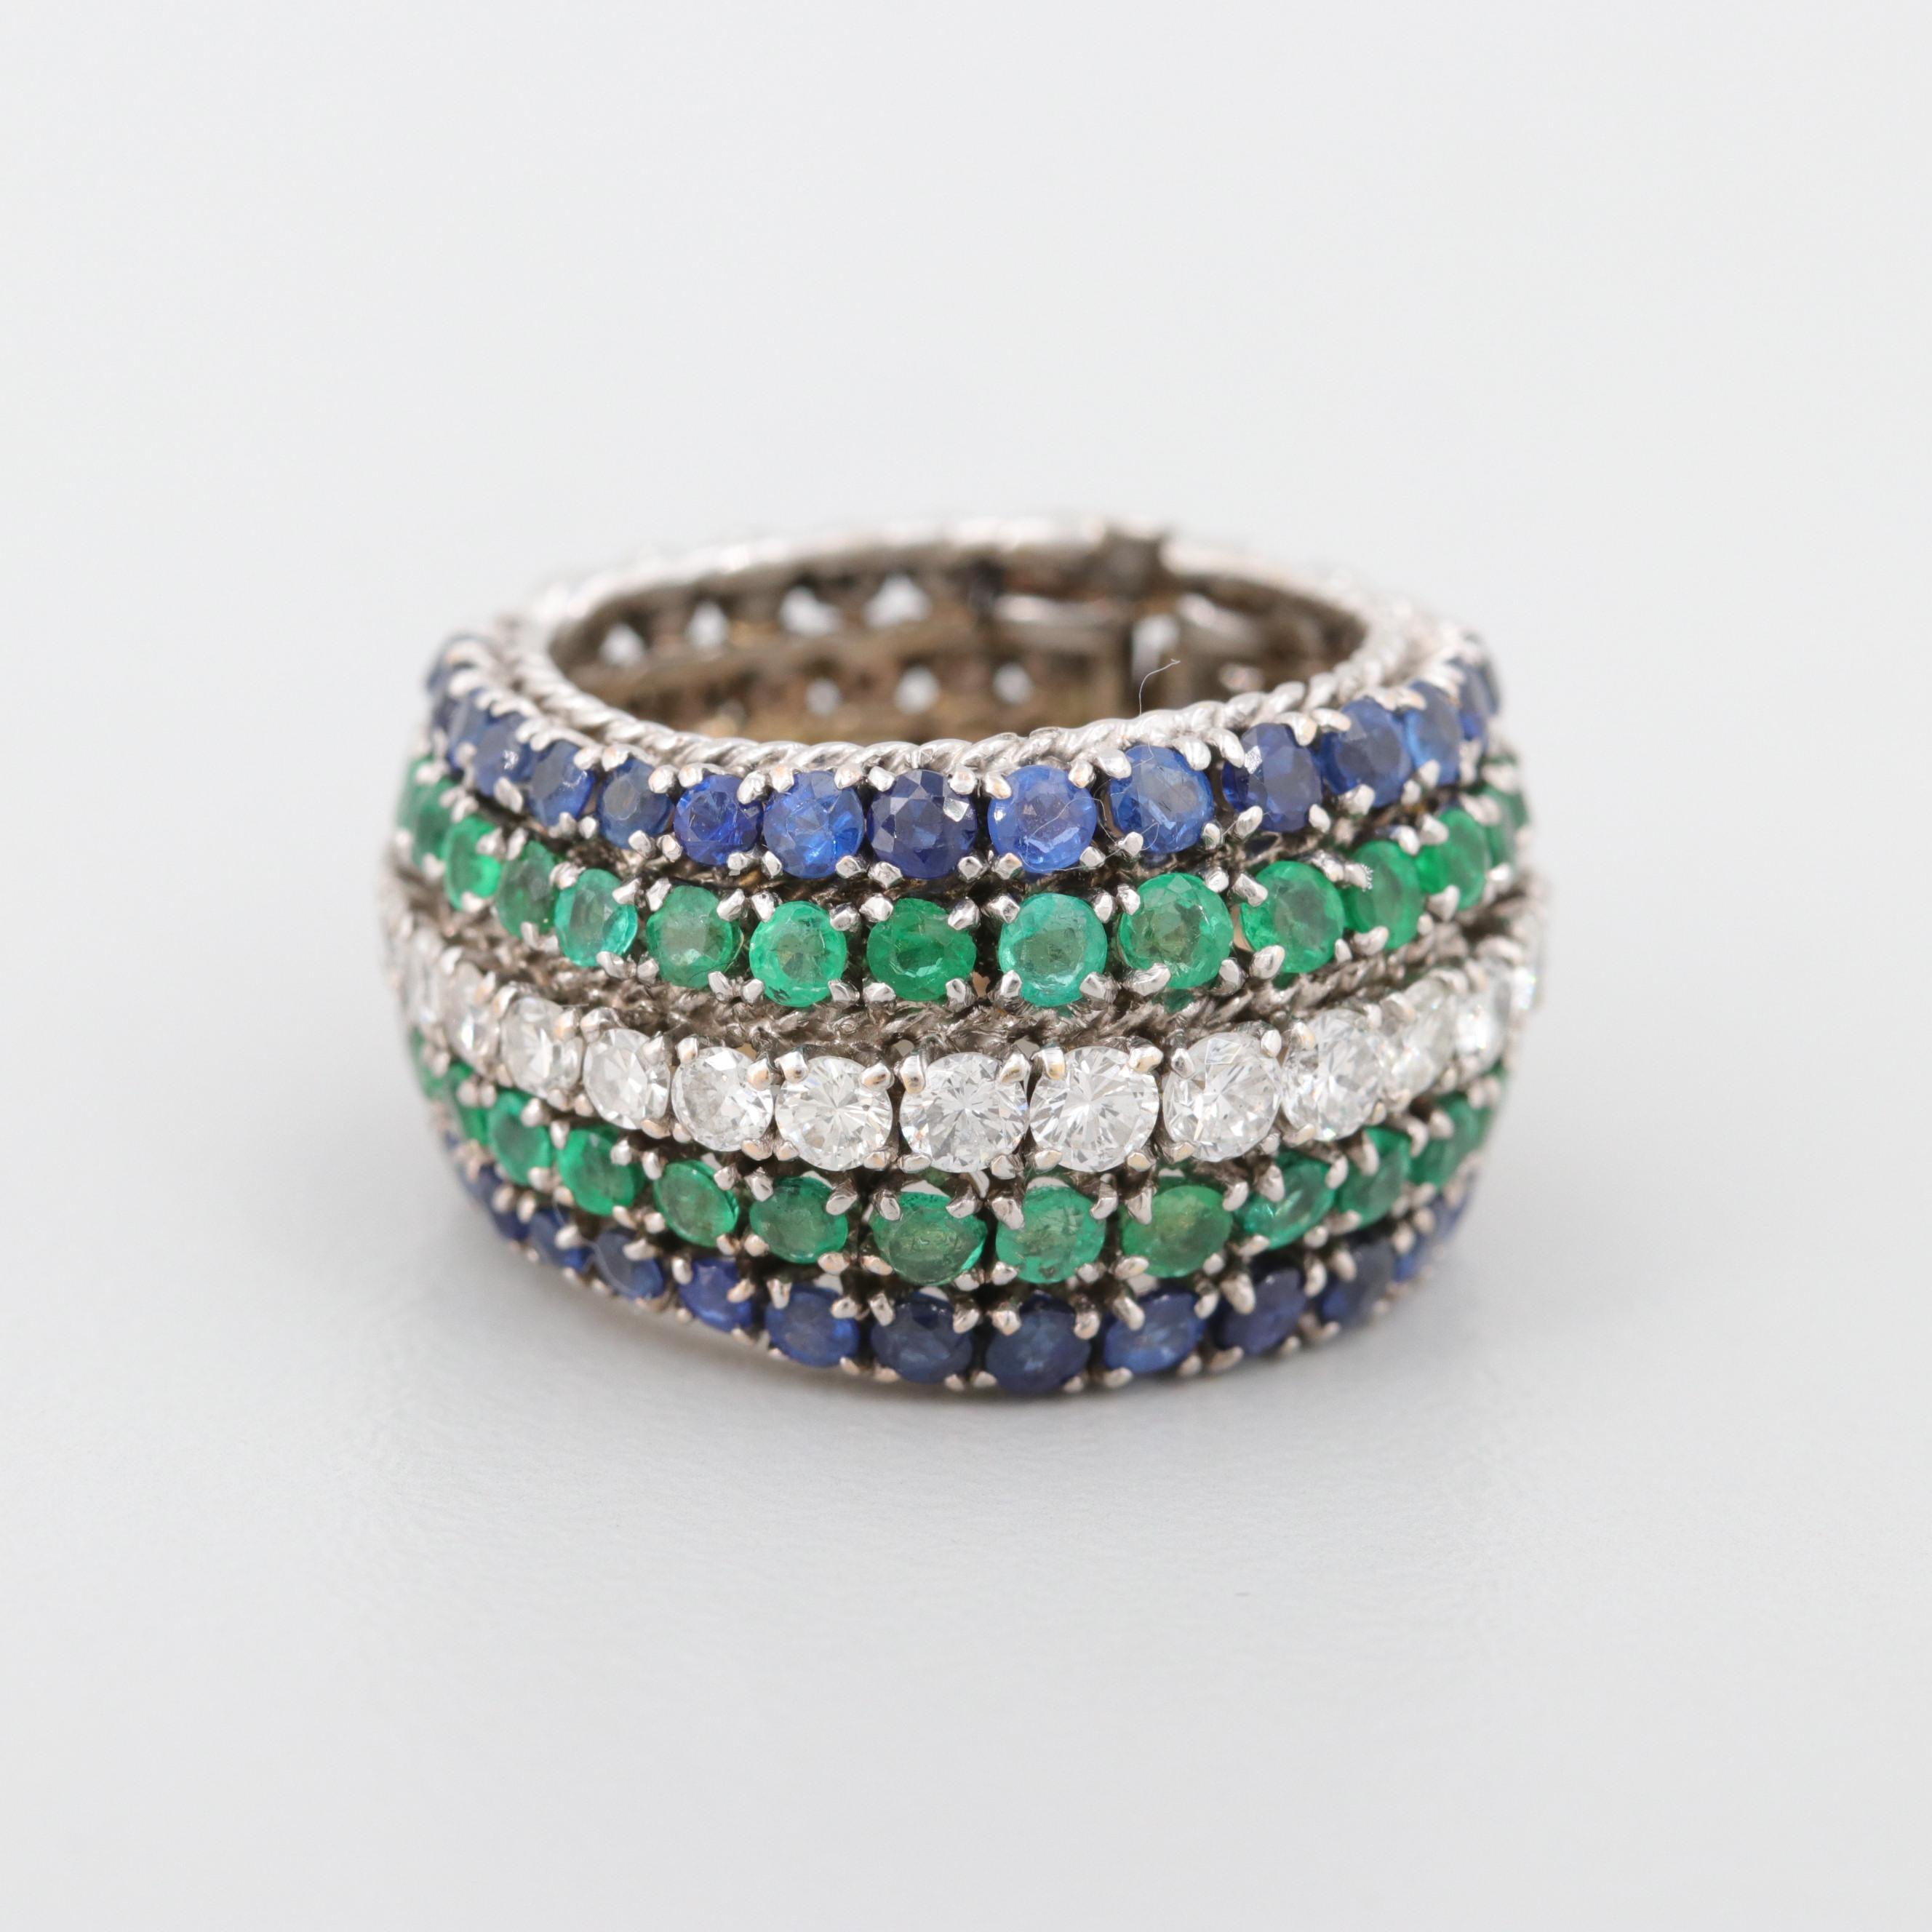 18K White Gold Diamond, Emerald and Sapphire Ring